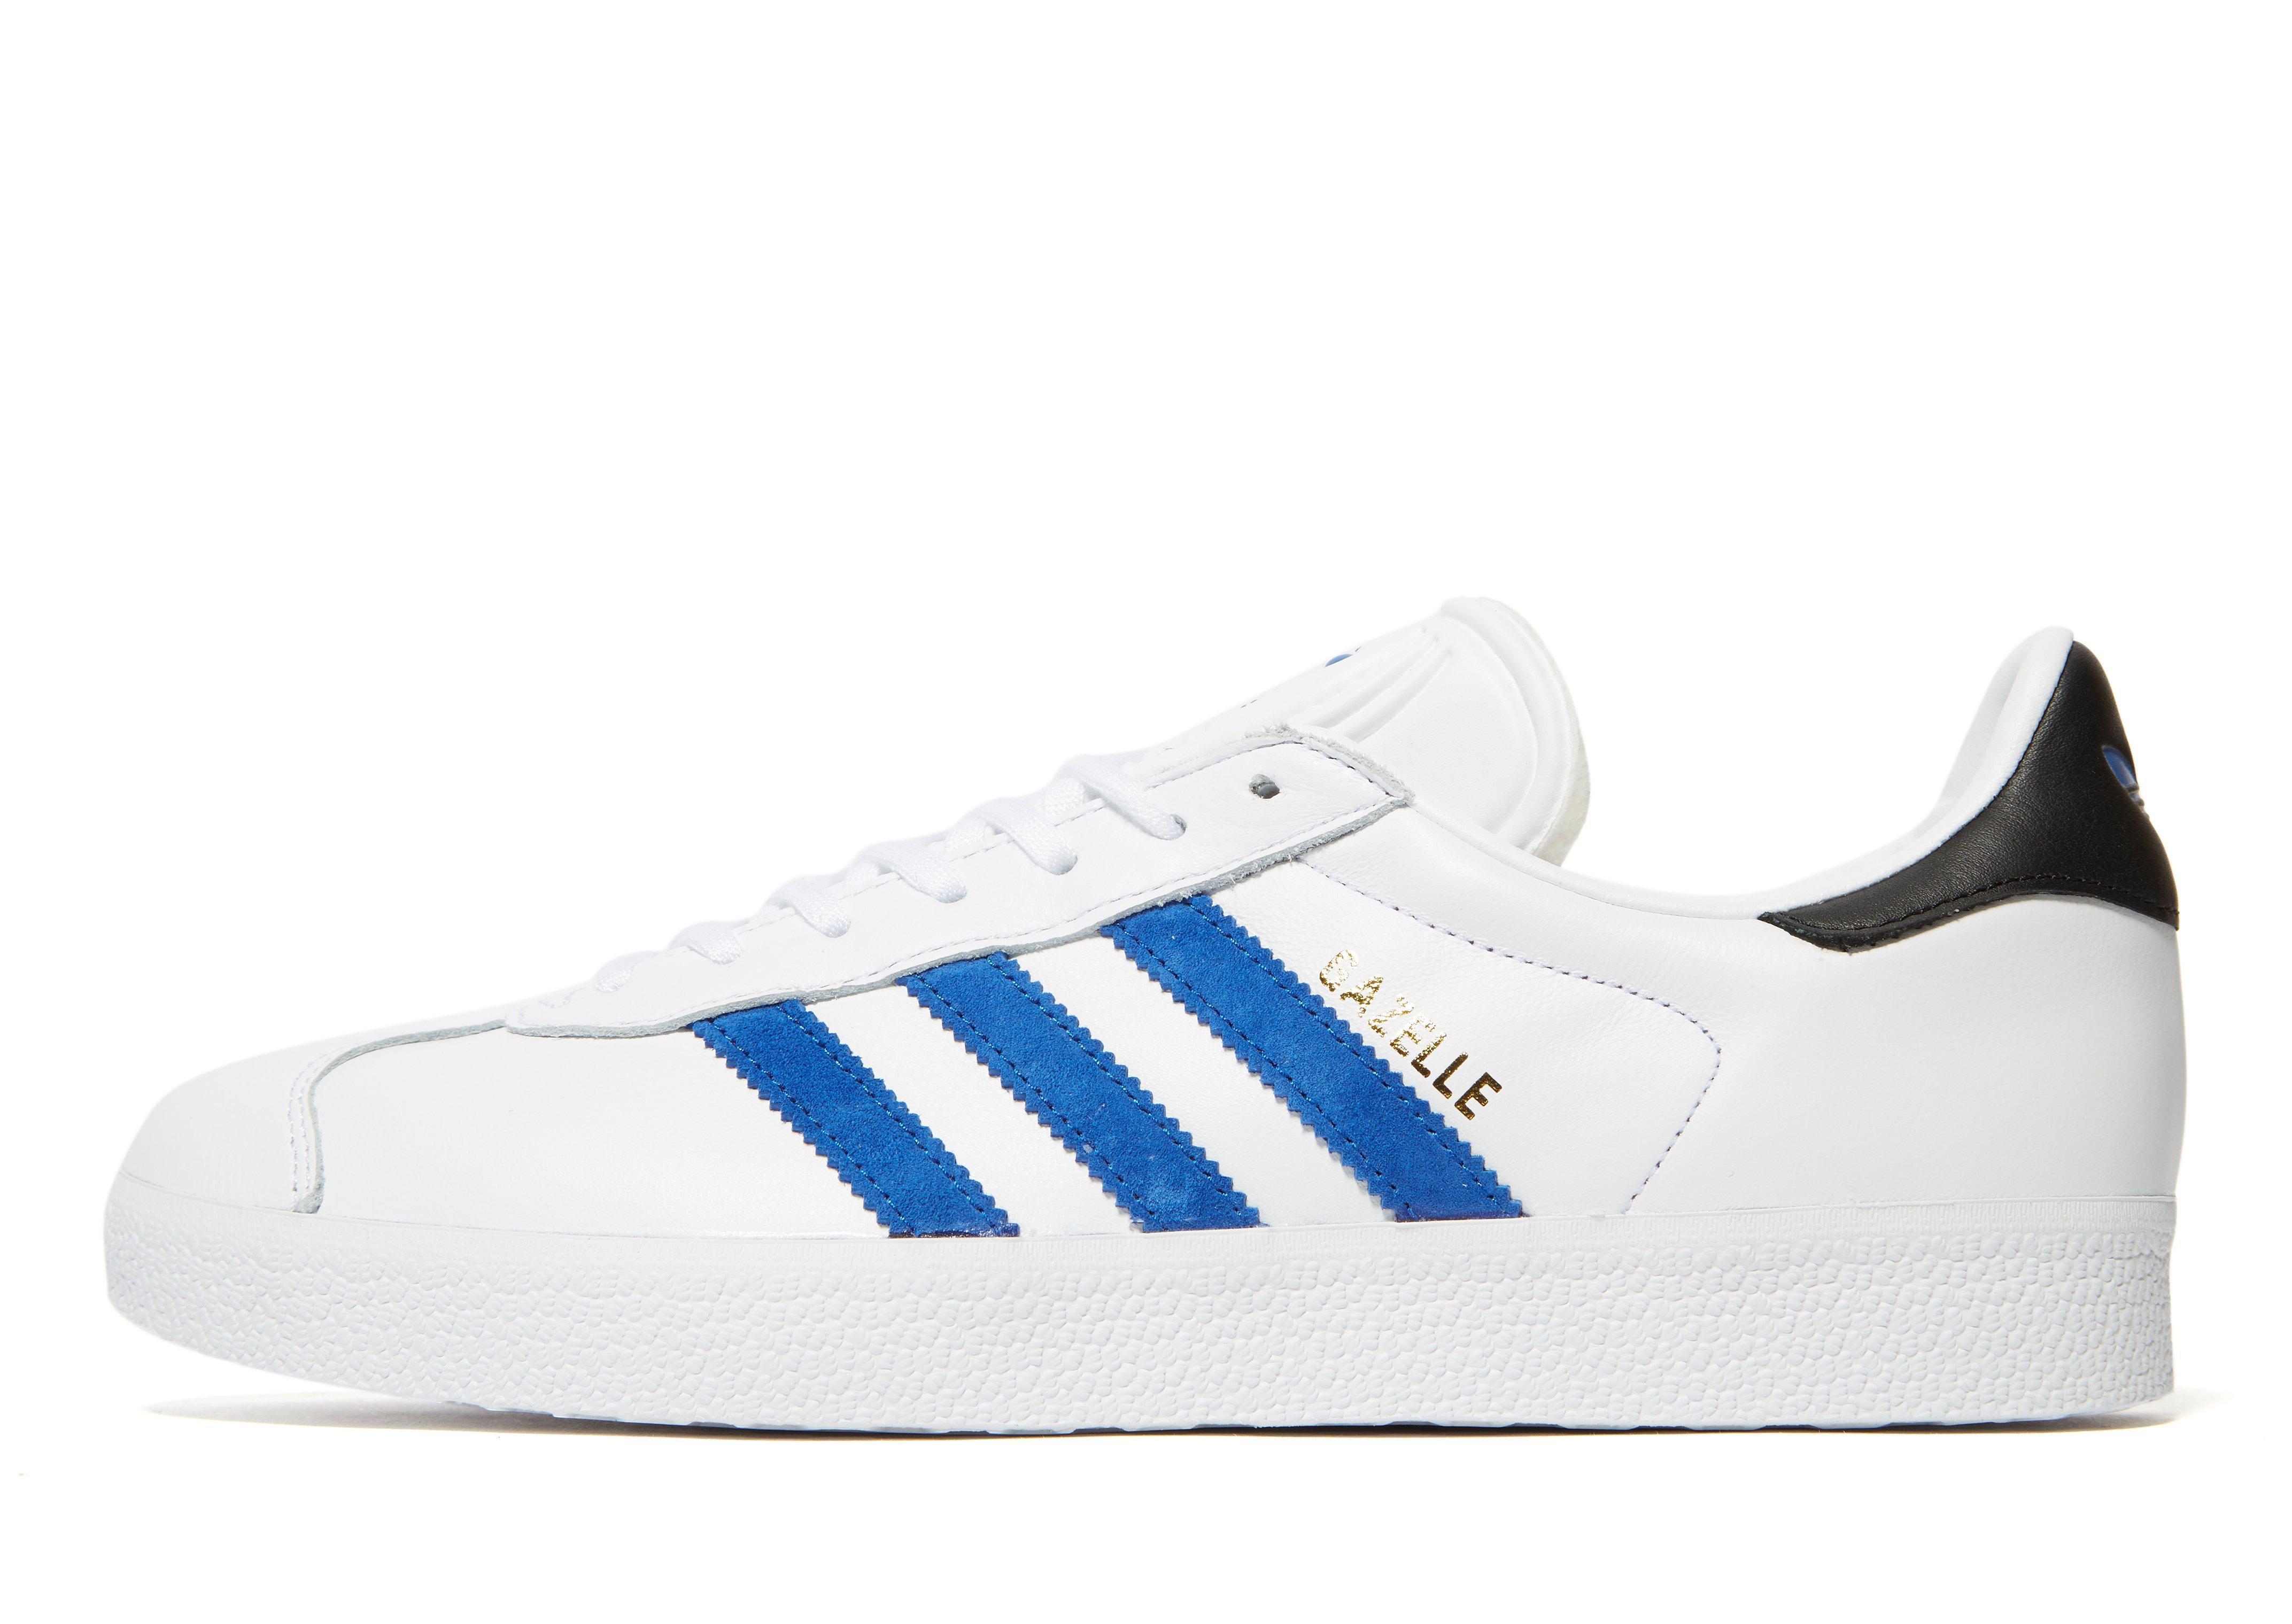 Adidas Originals Gazelle in Blue for Men - Lyst 54e60dc84985